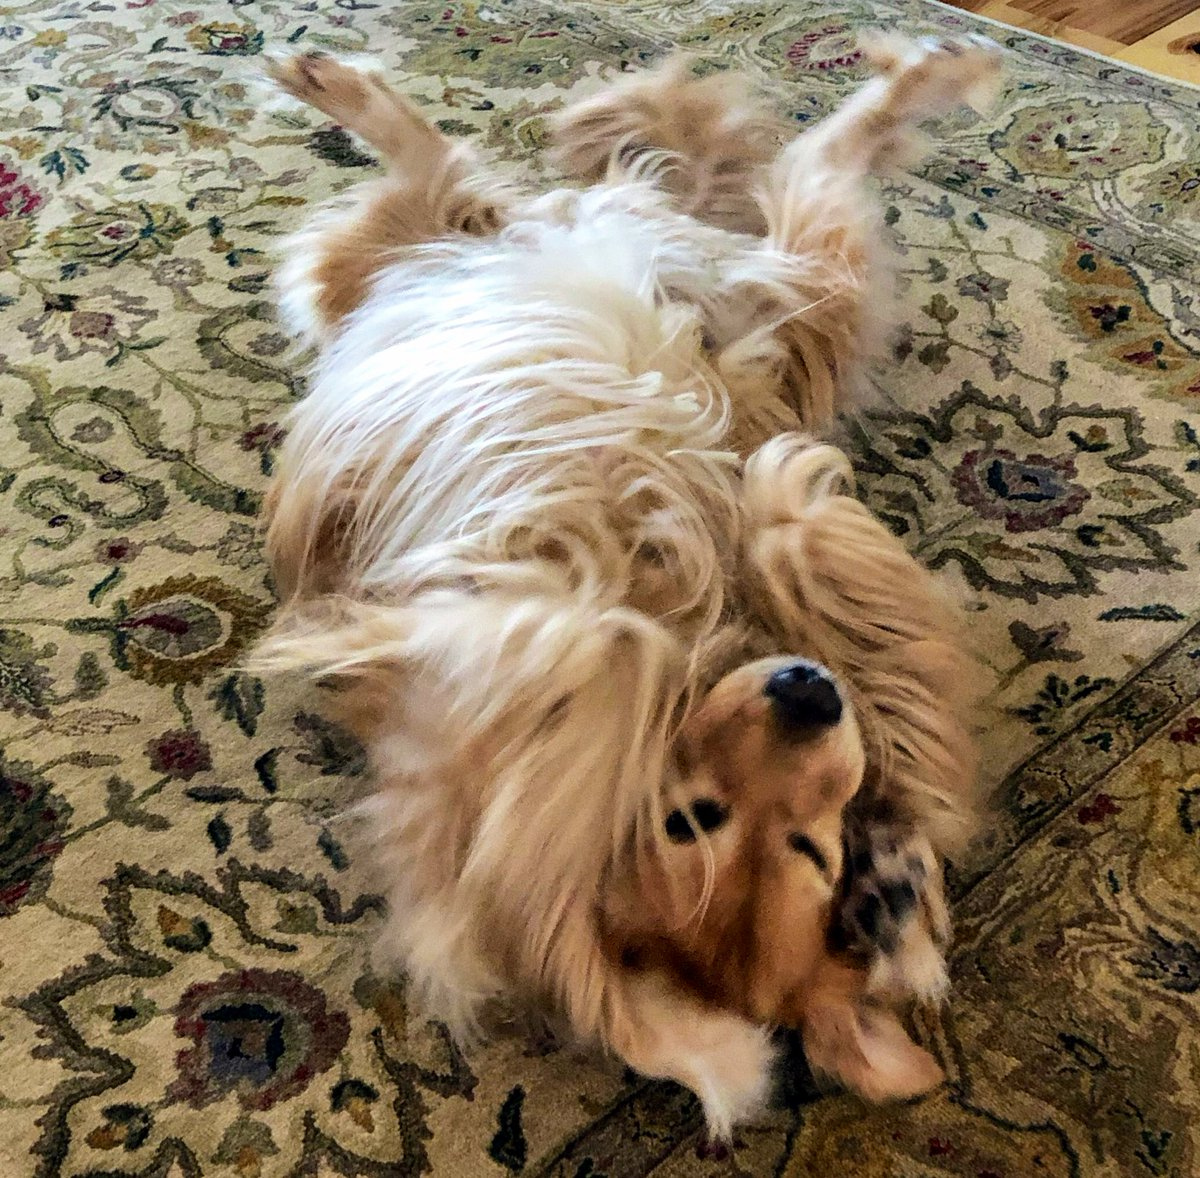 @GoldretrieverUS @WeeWalkingTours Tater hopes you like his fluff #fluffybuttfriday https://t.co/0B81OnB8ed